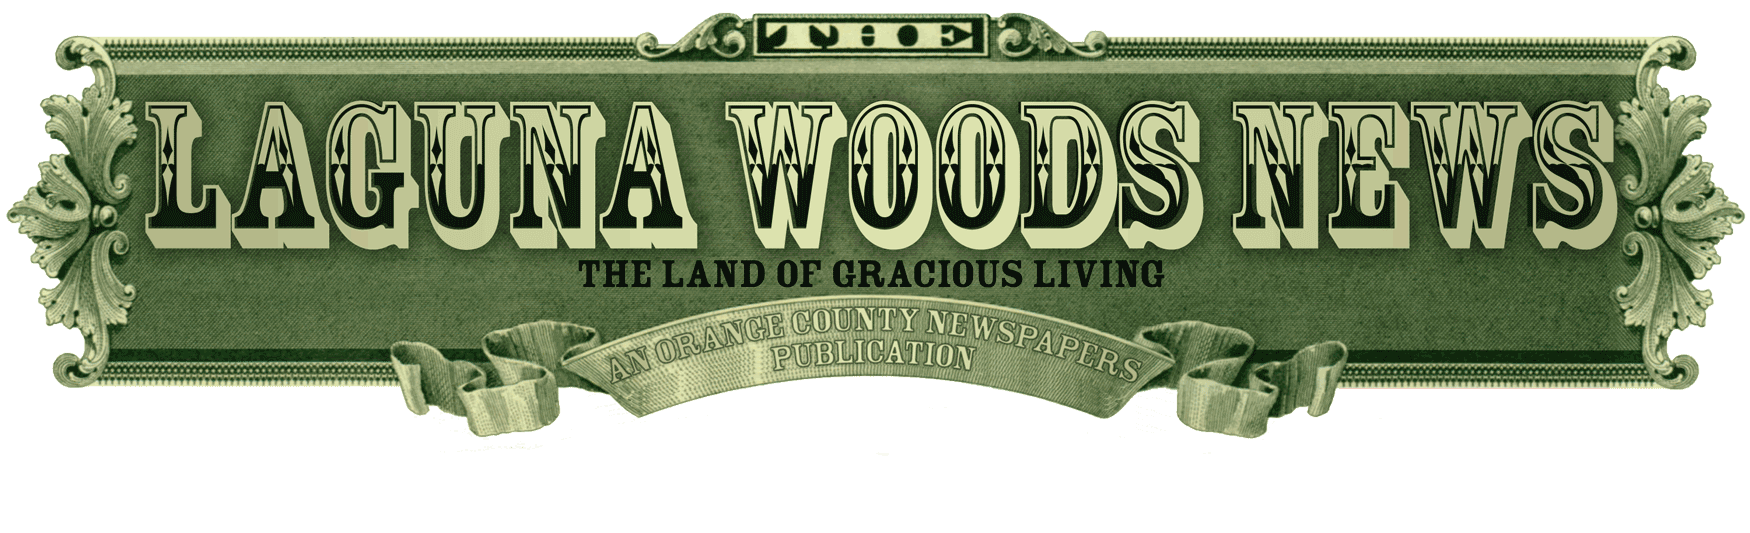 Laguna Woods Newspaper